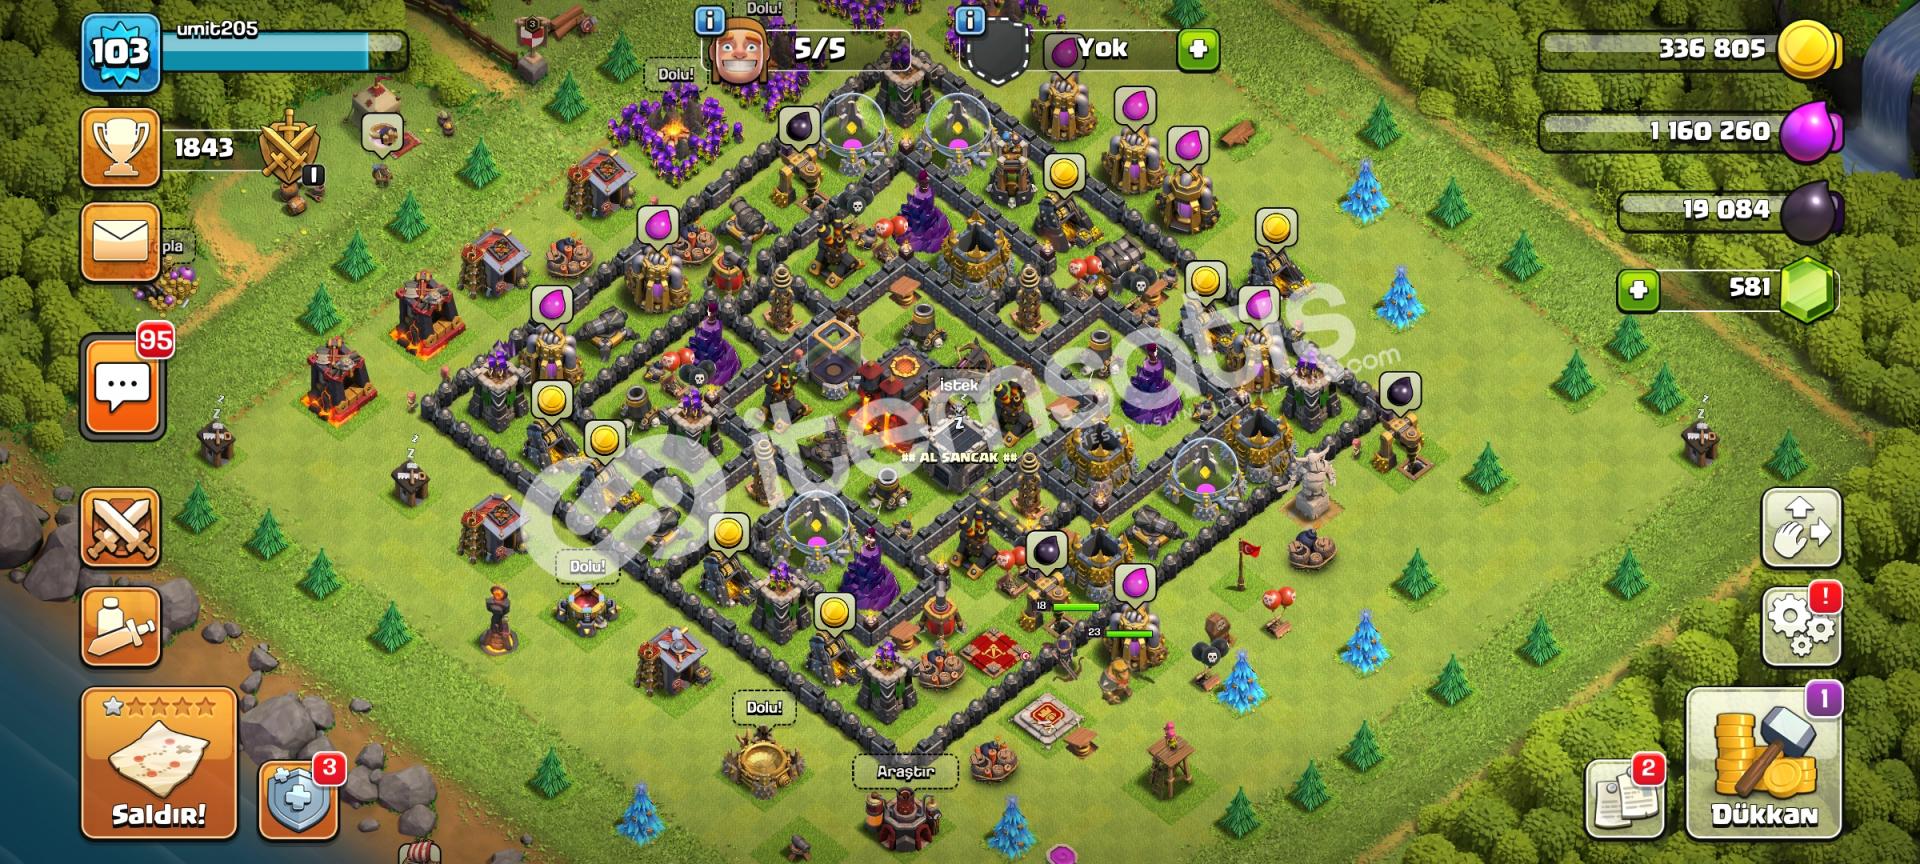 Clash of clans 103 lvl hesap